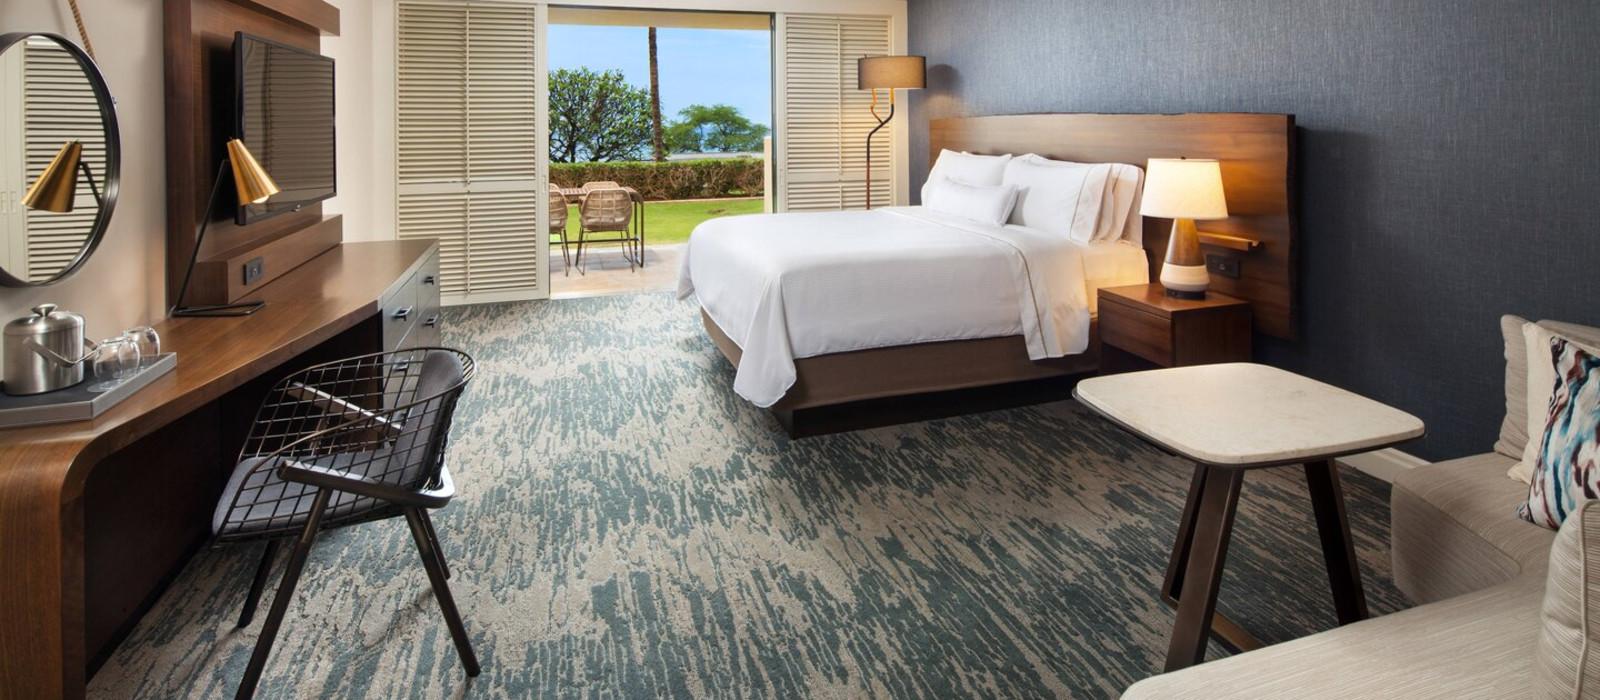 Hotel Westin Hapuna Beach Resort (Kohala Coast, West Side) Hawaii